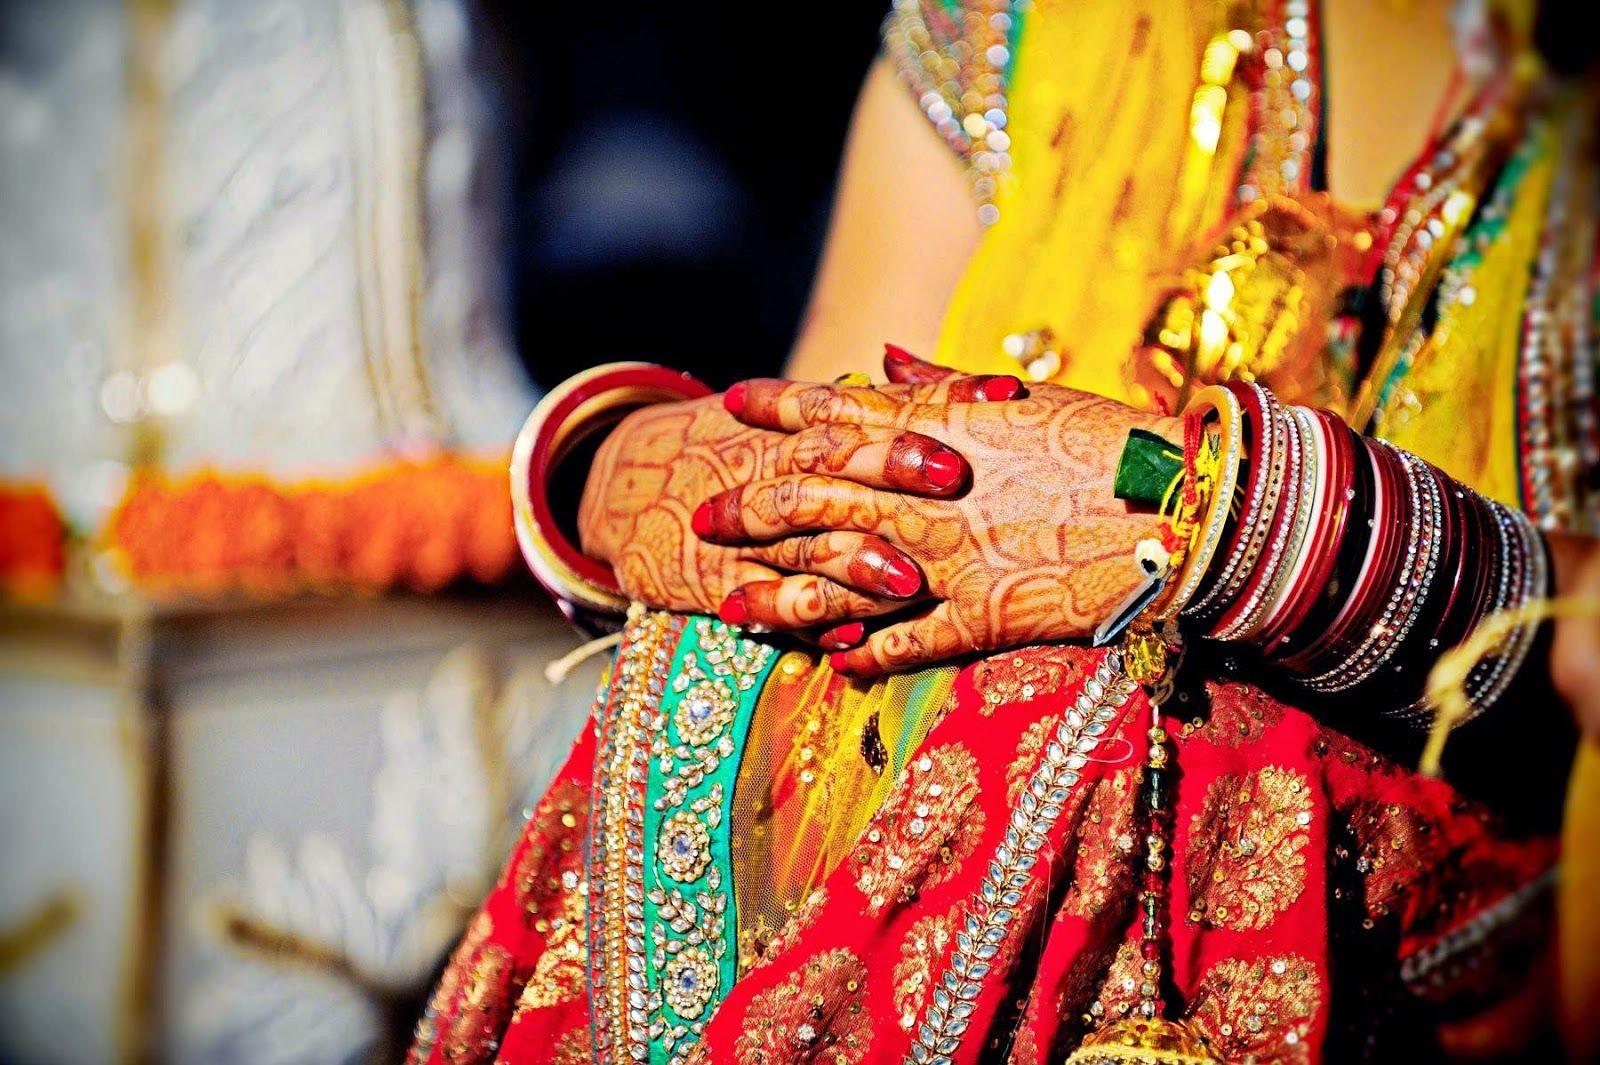 naruto wedding rings